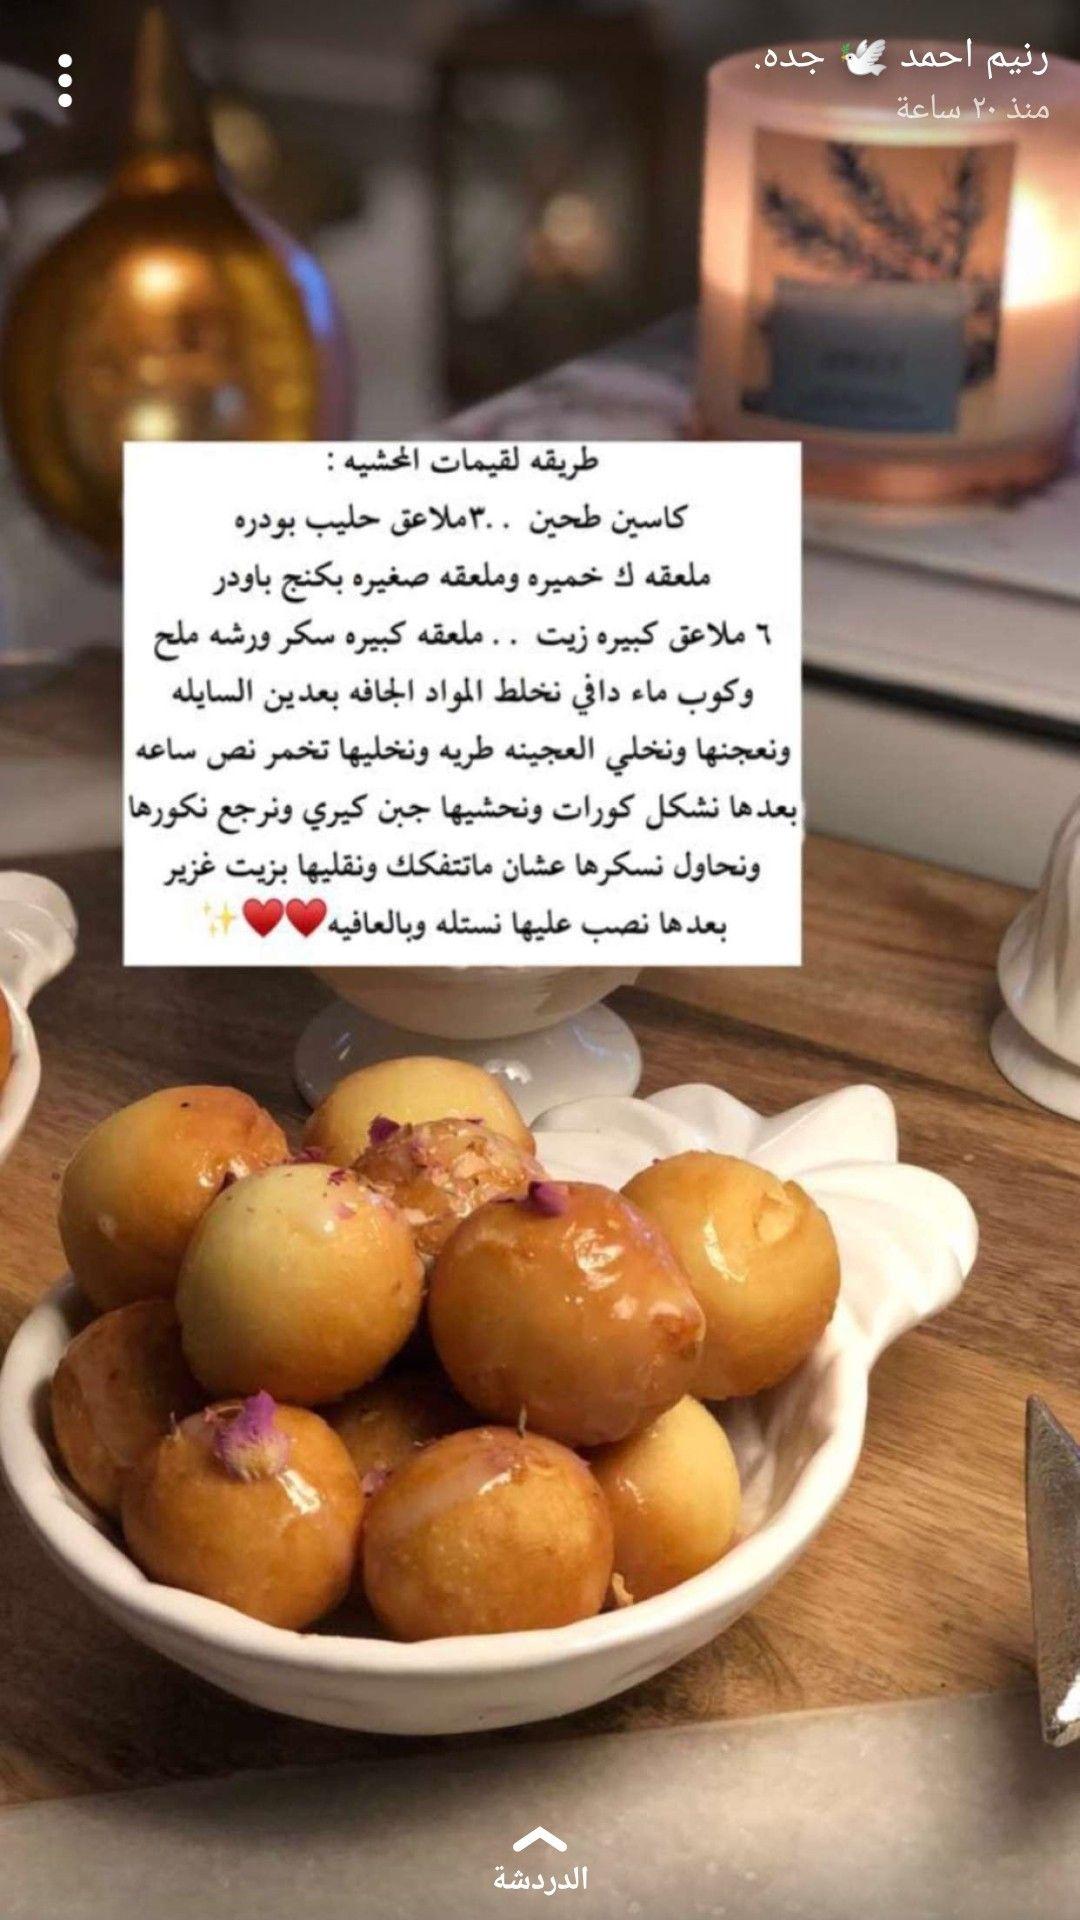 Pin By Hana On طبخات وضيافة عربية وعالمية Yummy Food Dessert Cookout Food Food Recipies